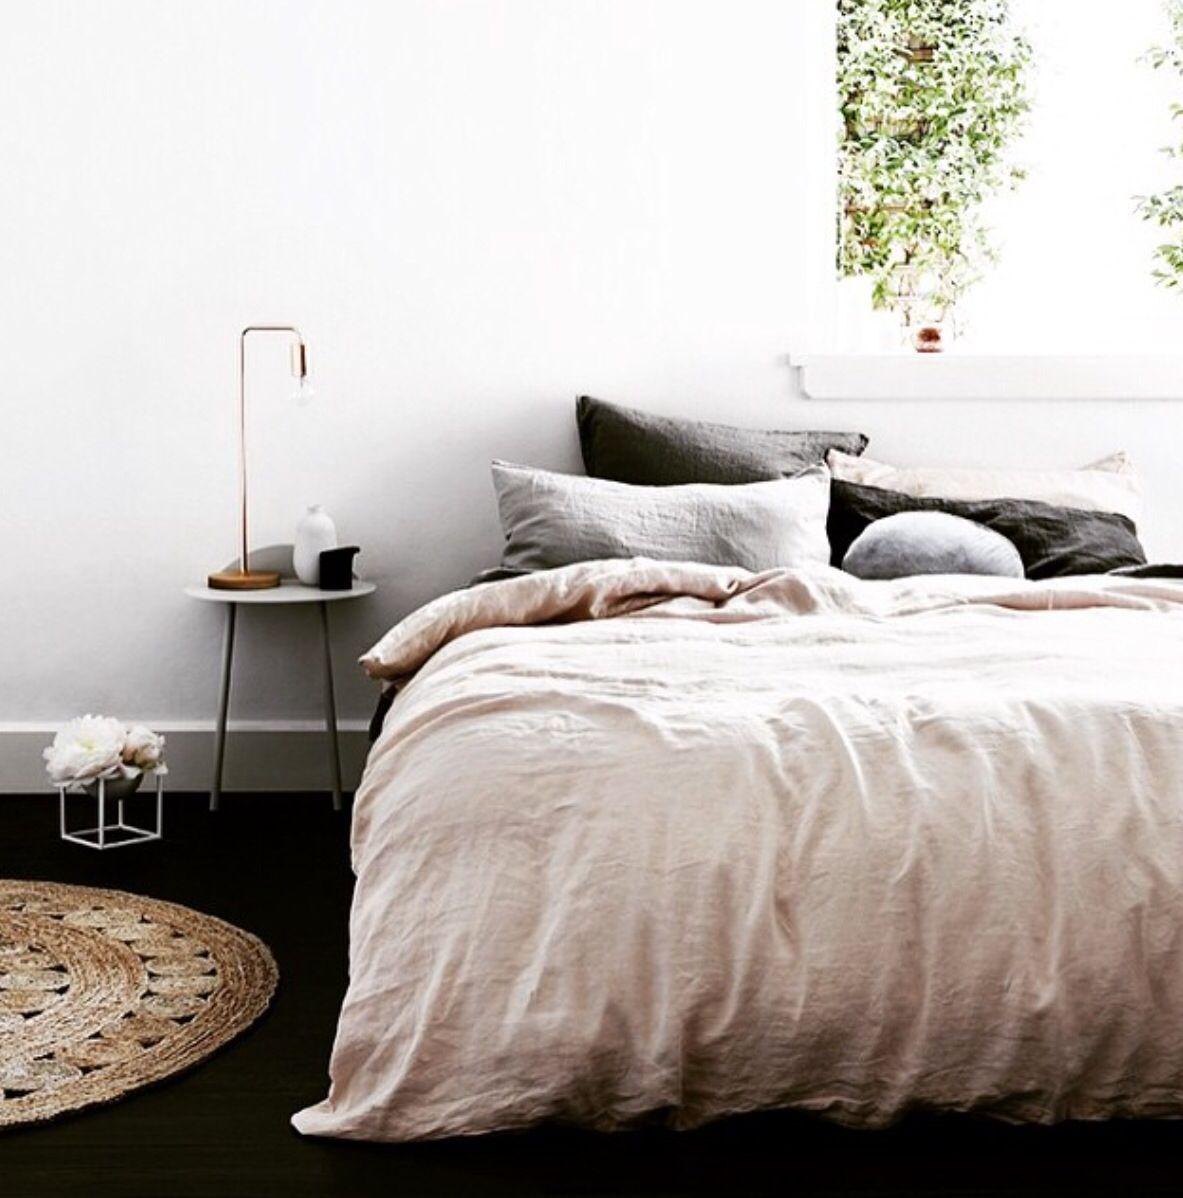 Oud-roze | Slaapkamer | Pinterest | Bedrooms and Decorating